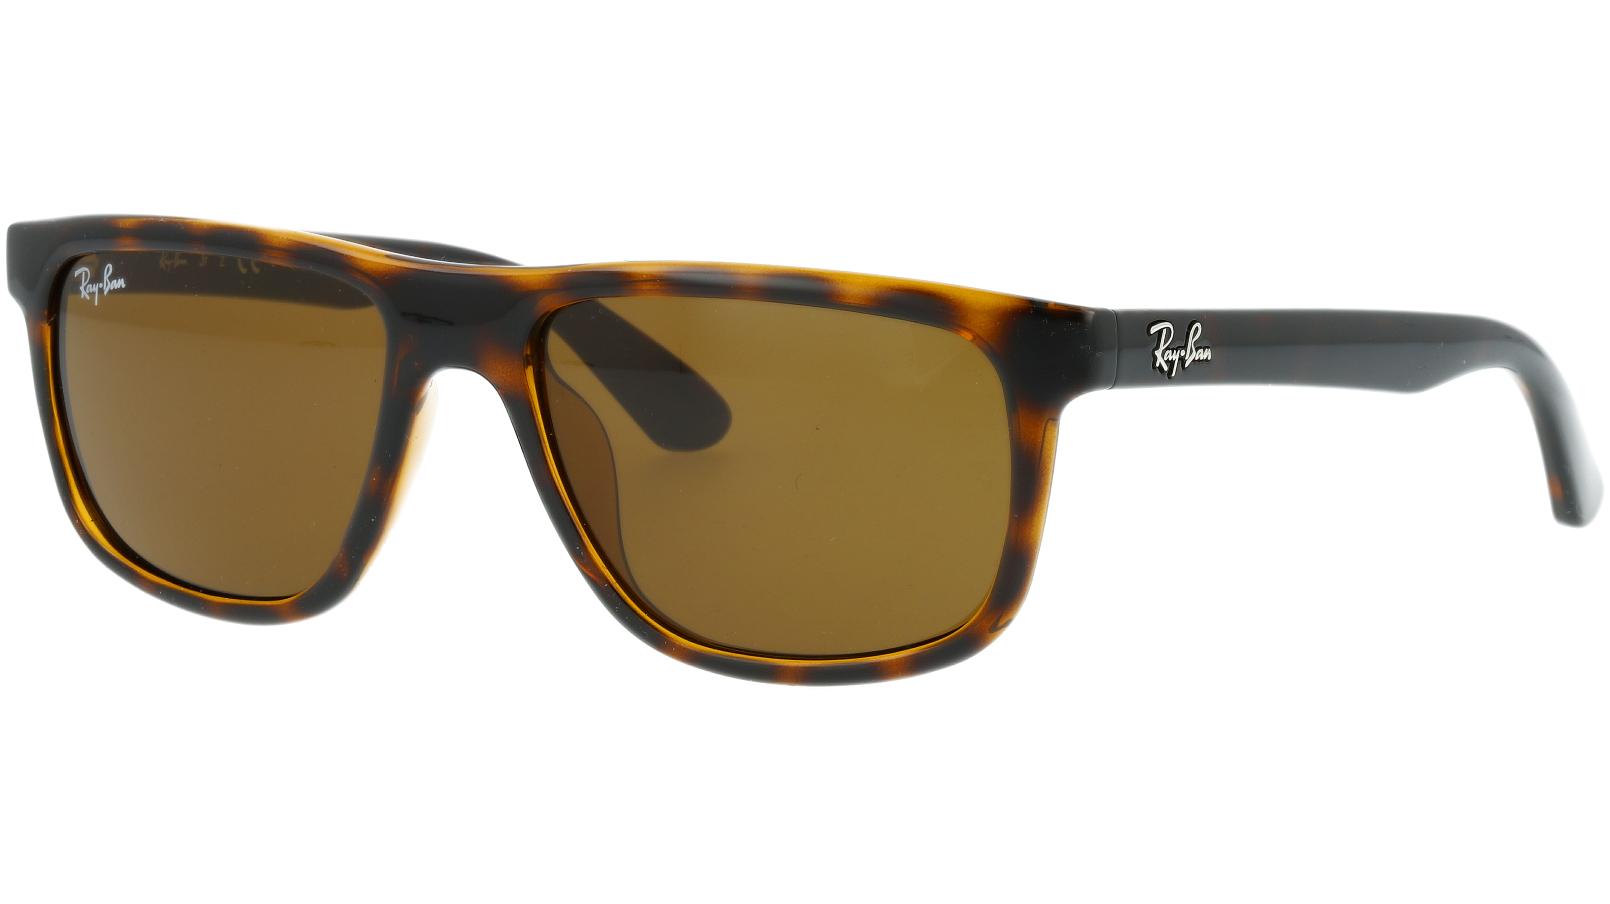 RAYBAN RJ9057S 152/73 50 HAVANA Sunglasses